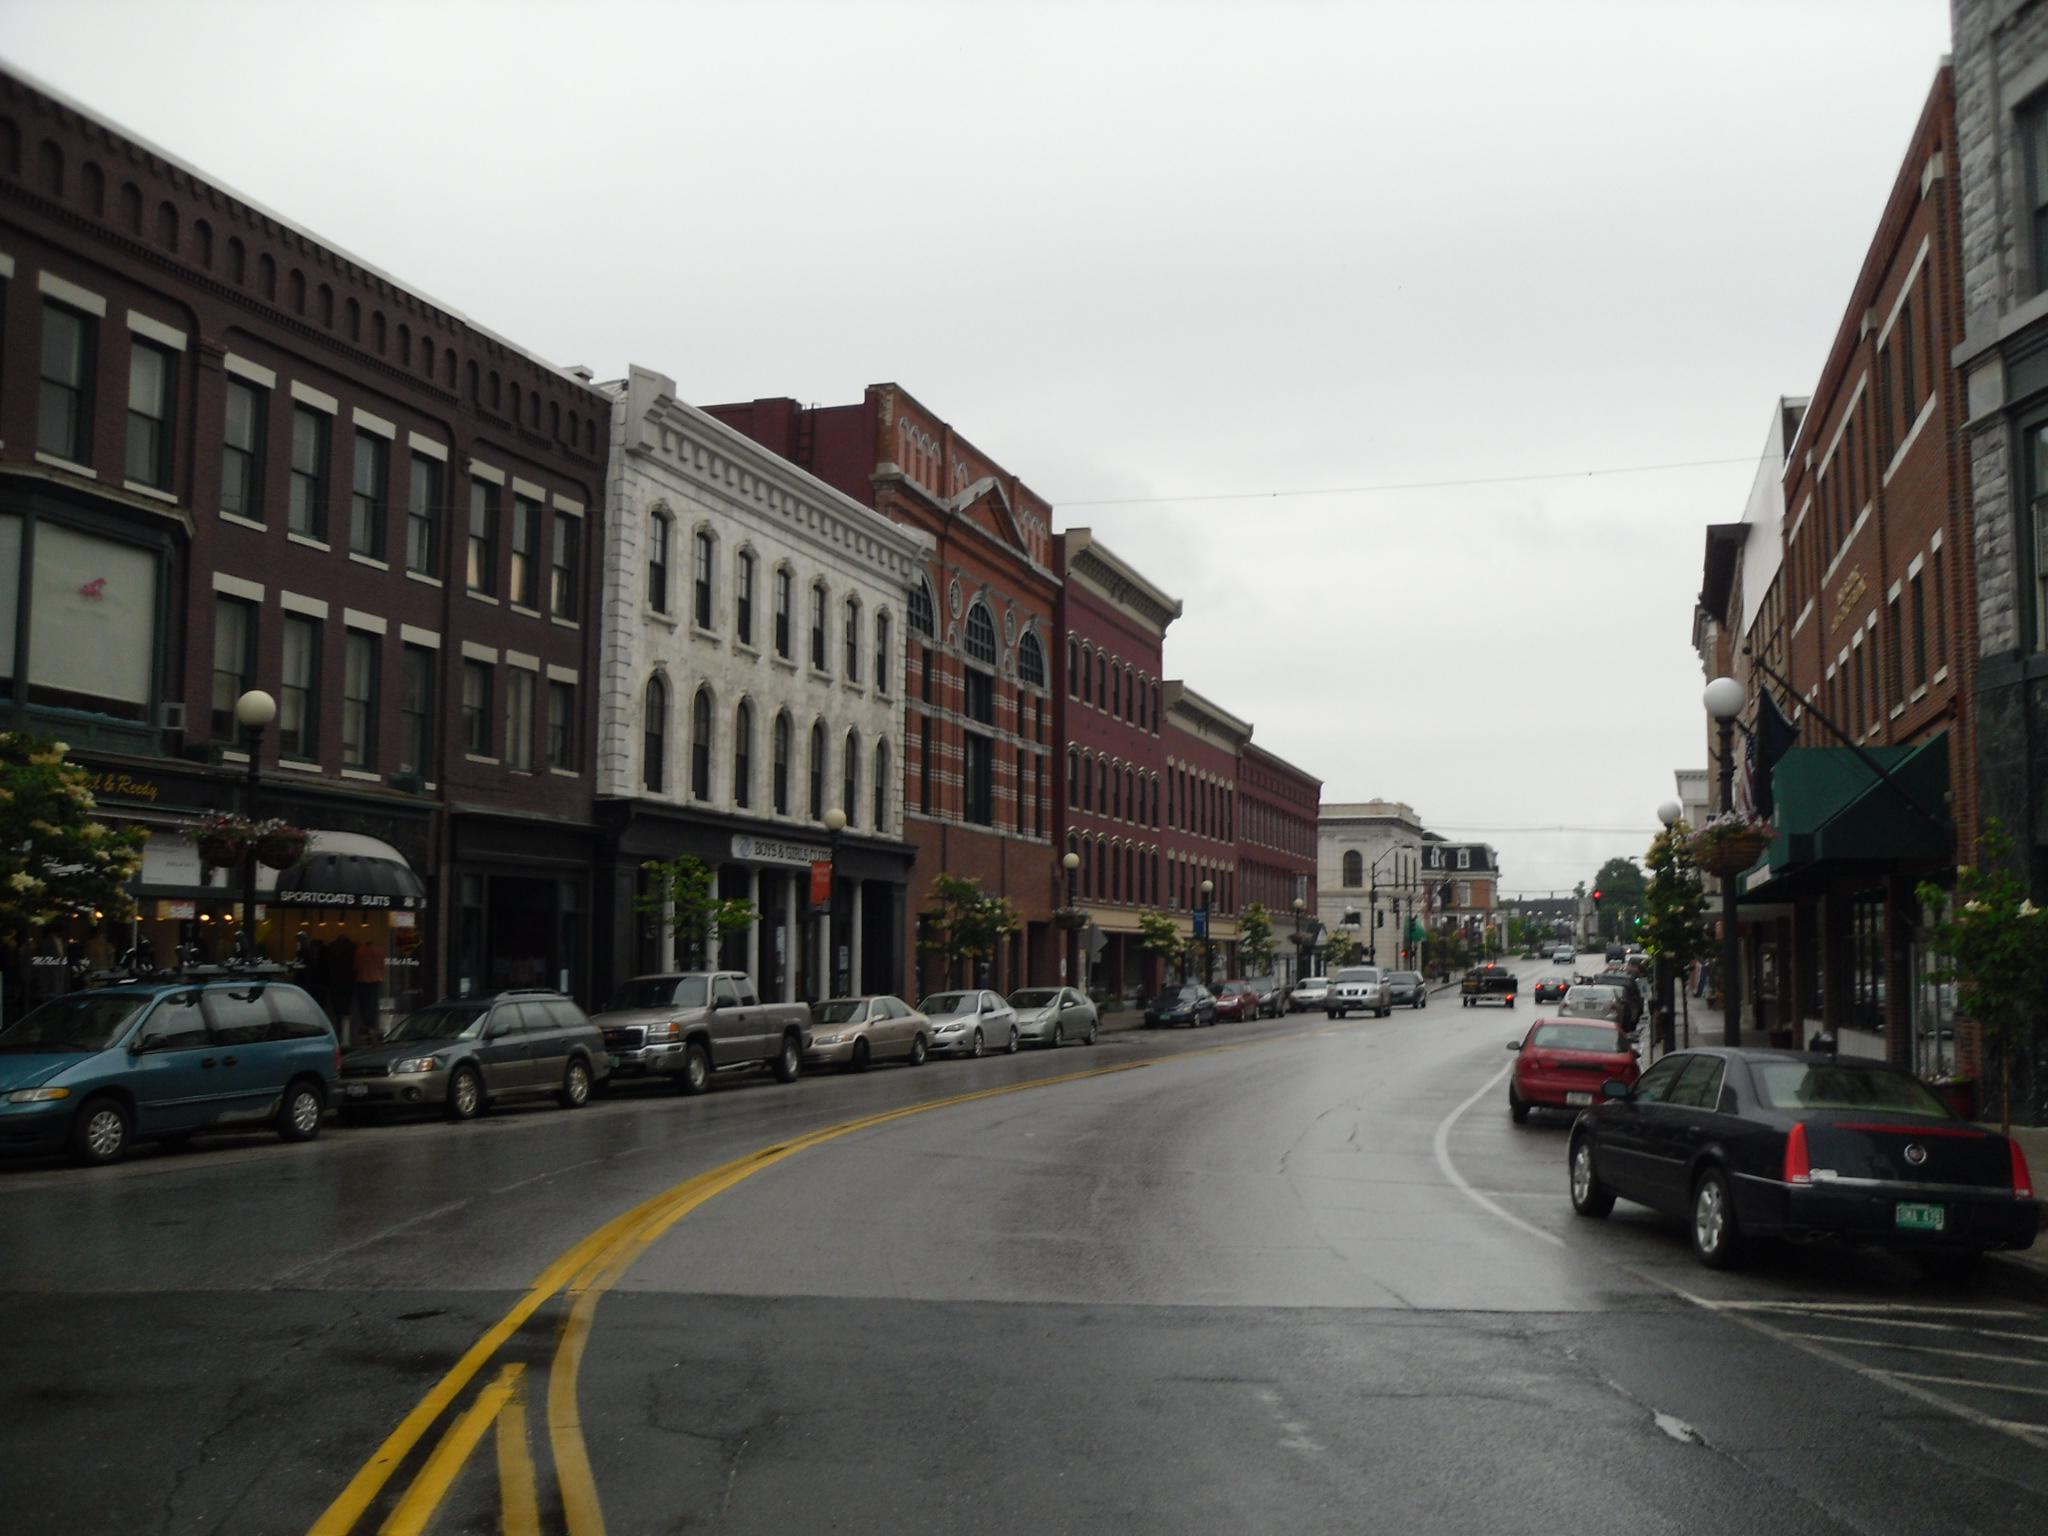 Rutland (VT) United States  city photos gallery : Description Rutland, Vermont